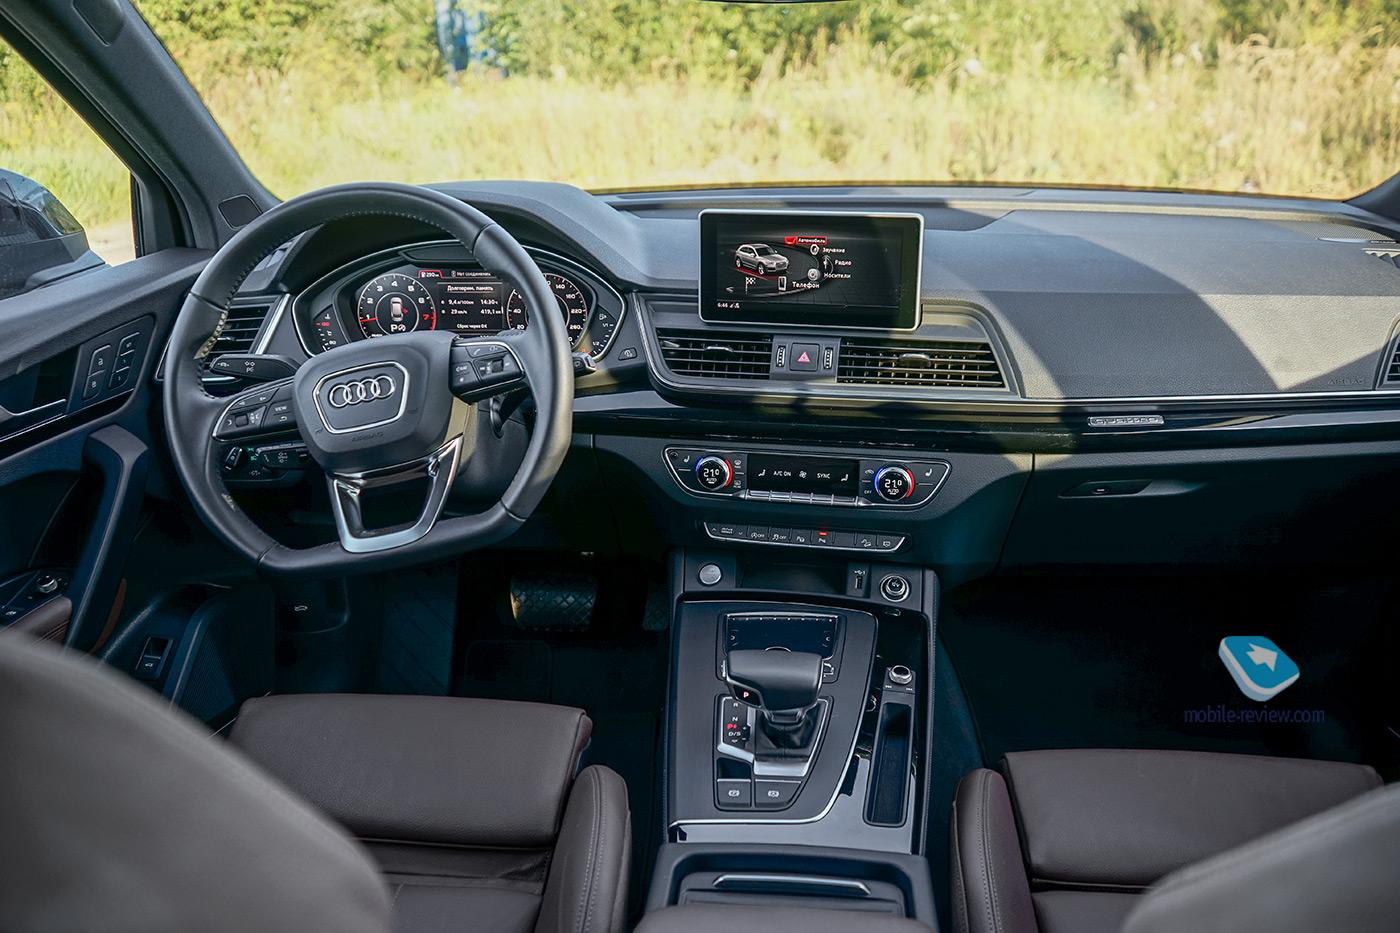 Тест Audi Q5 2021. Рестайлинг популярного SUV